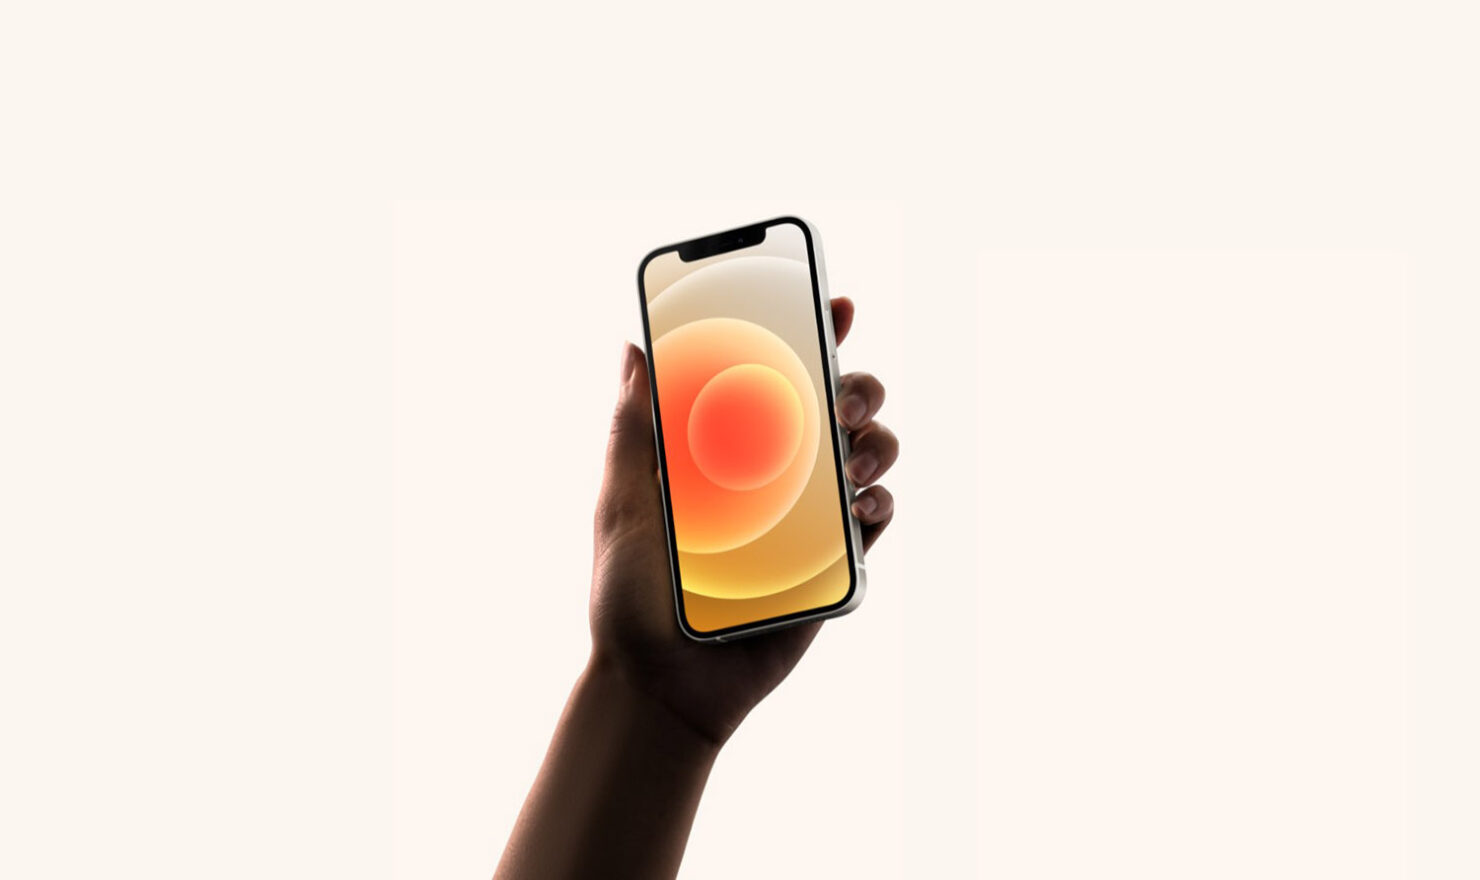 iPhone 13 mini Won't Be Canceled, Despite Poor Sales of the iPhone 12 mini